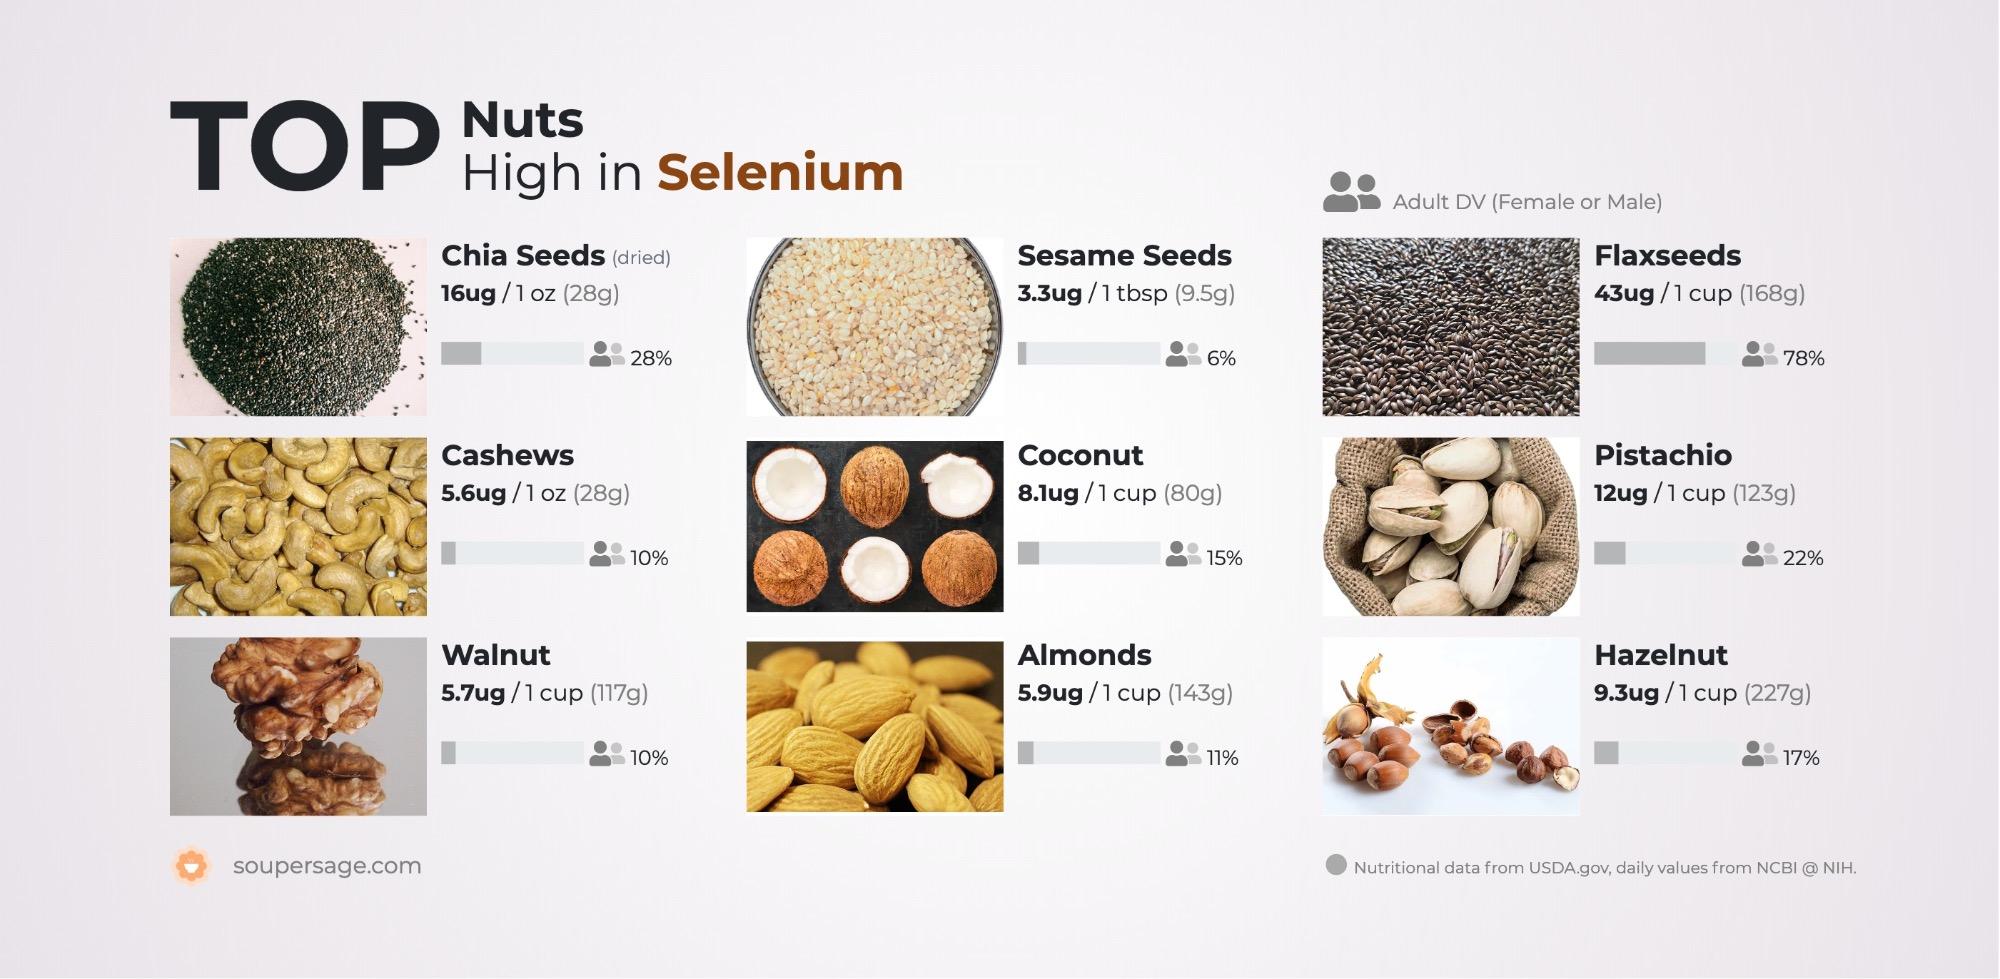 image of Top Nuts High in Selenium